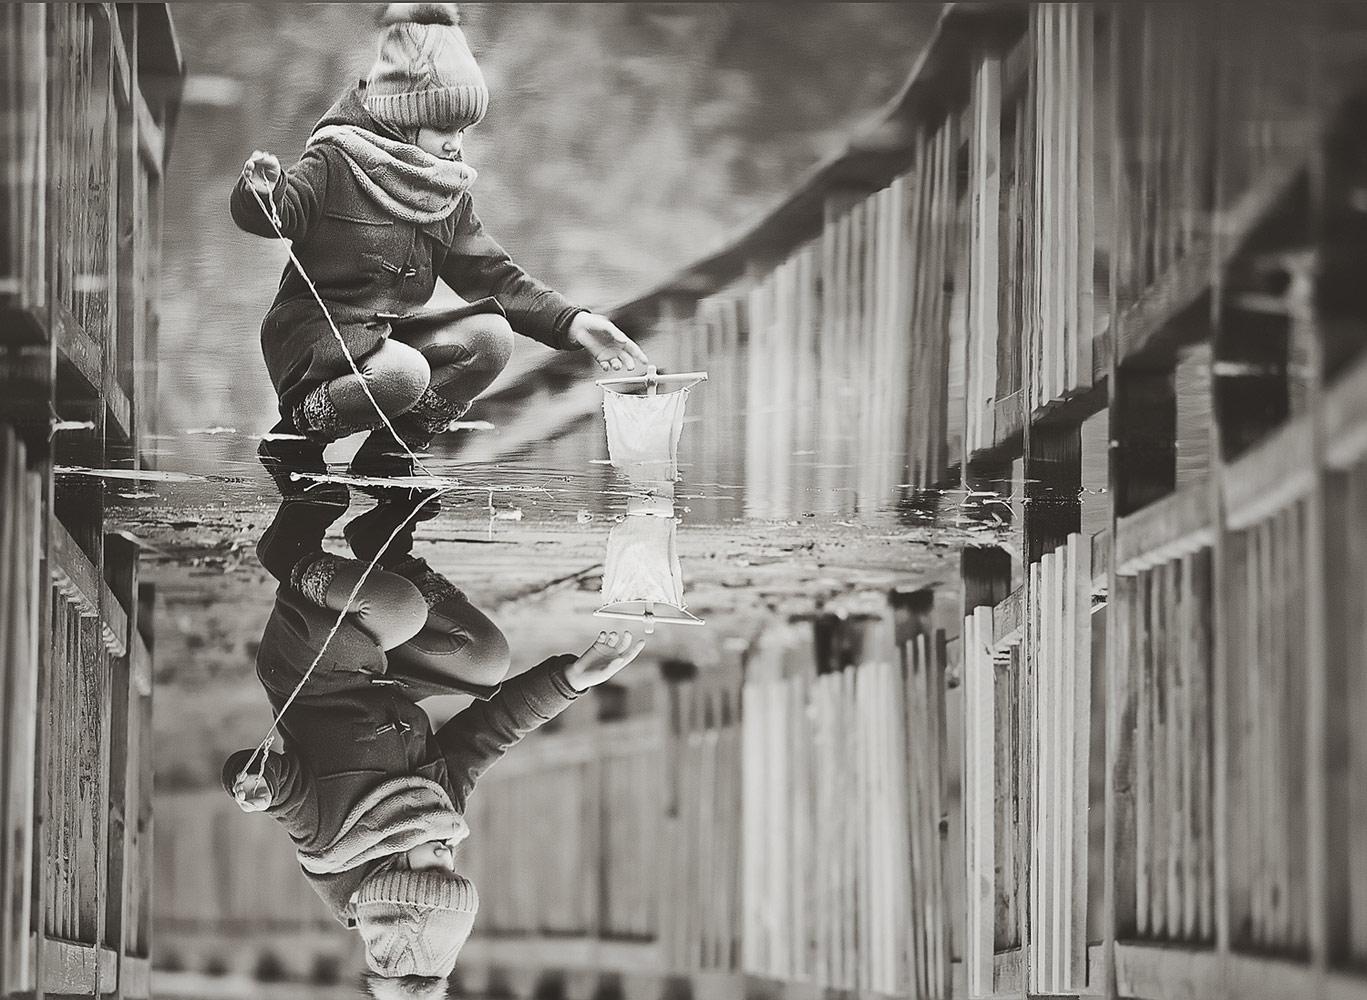 Козлова Елена / Кораблик, 3 место в категории «Москва и москвичи. Комфортный город», Фотоконкурс «Планета Москва»